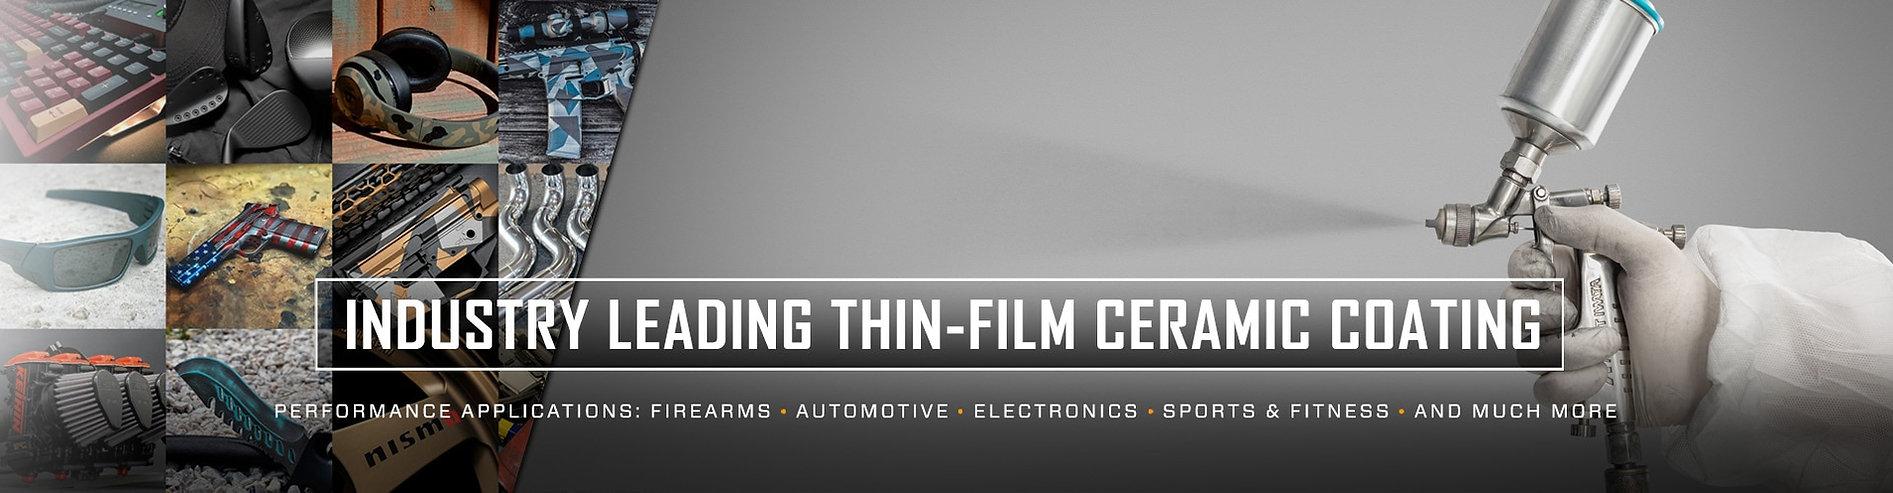 the-industry-leading-thin-filmed-ceramic-coating-dt20200111011318618.jpeg